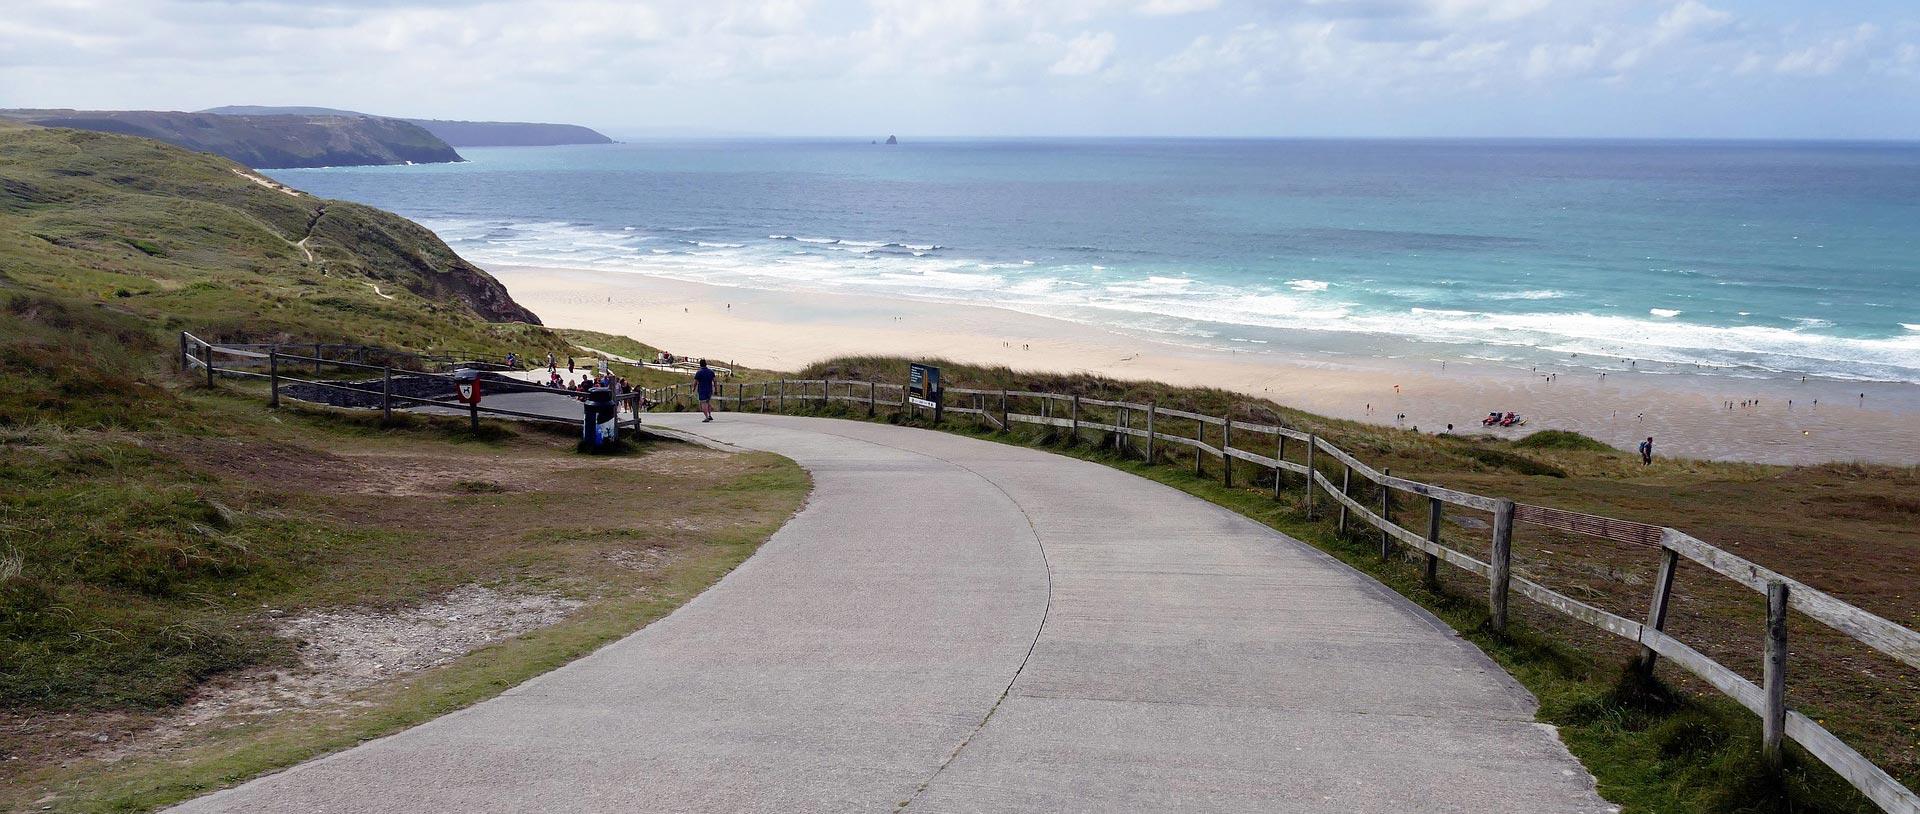 Coast Road to Beach